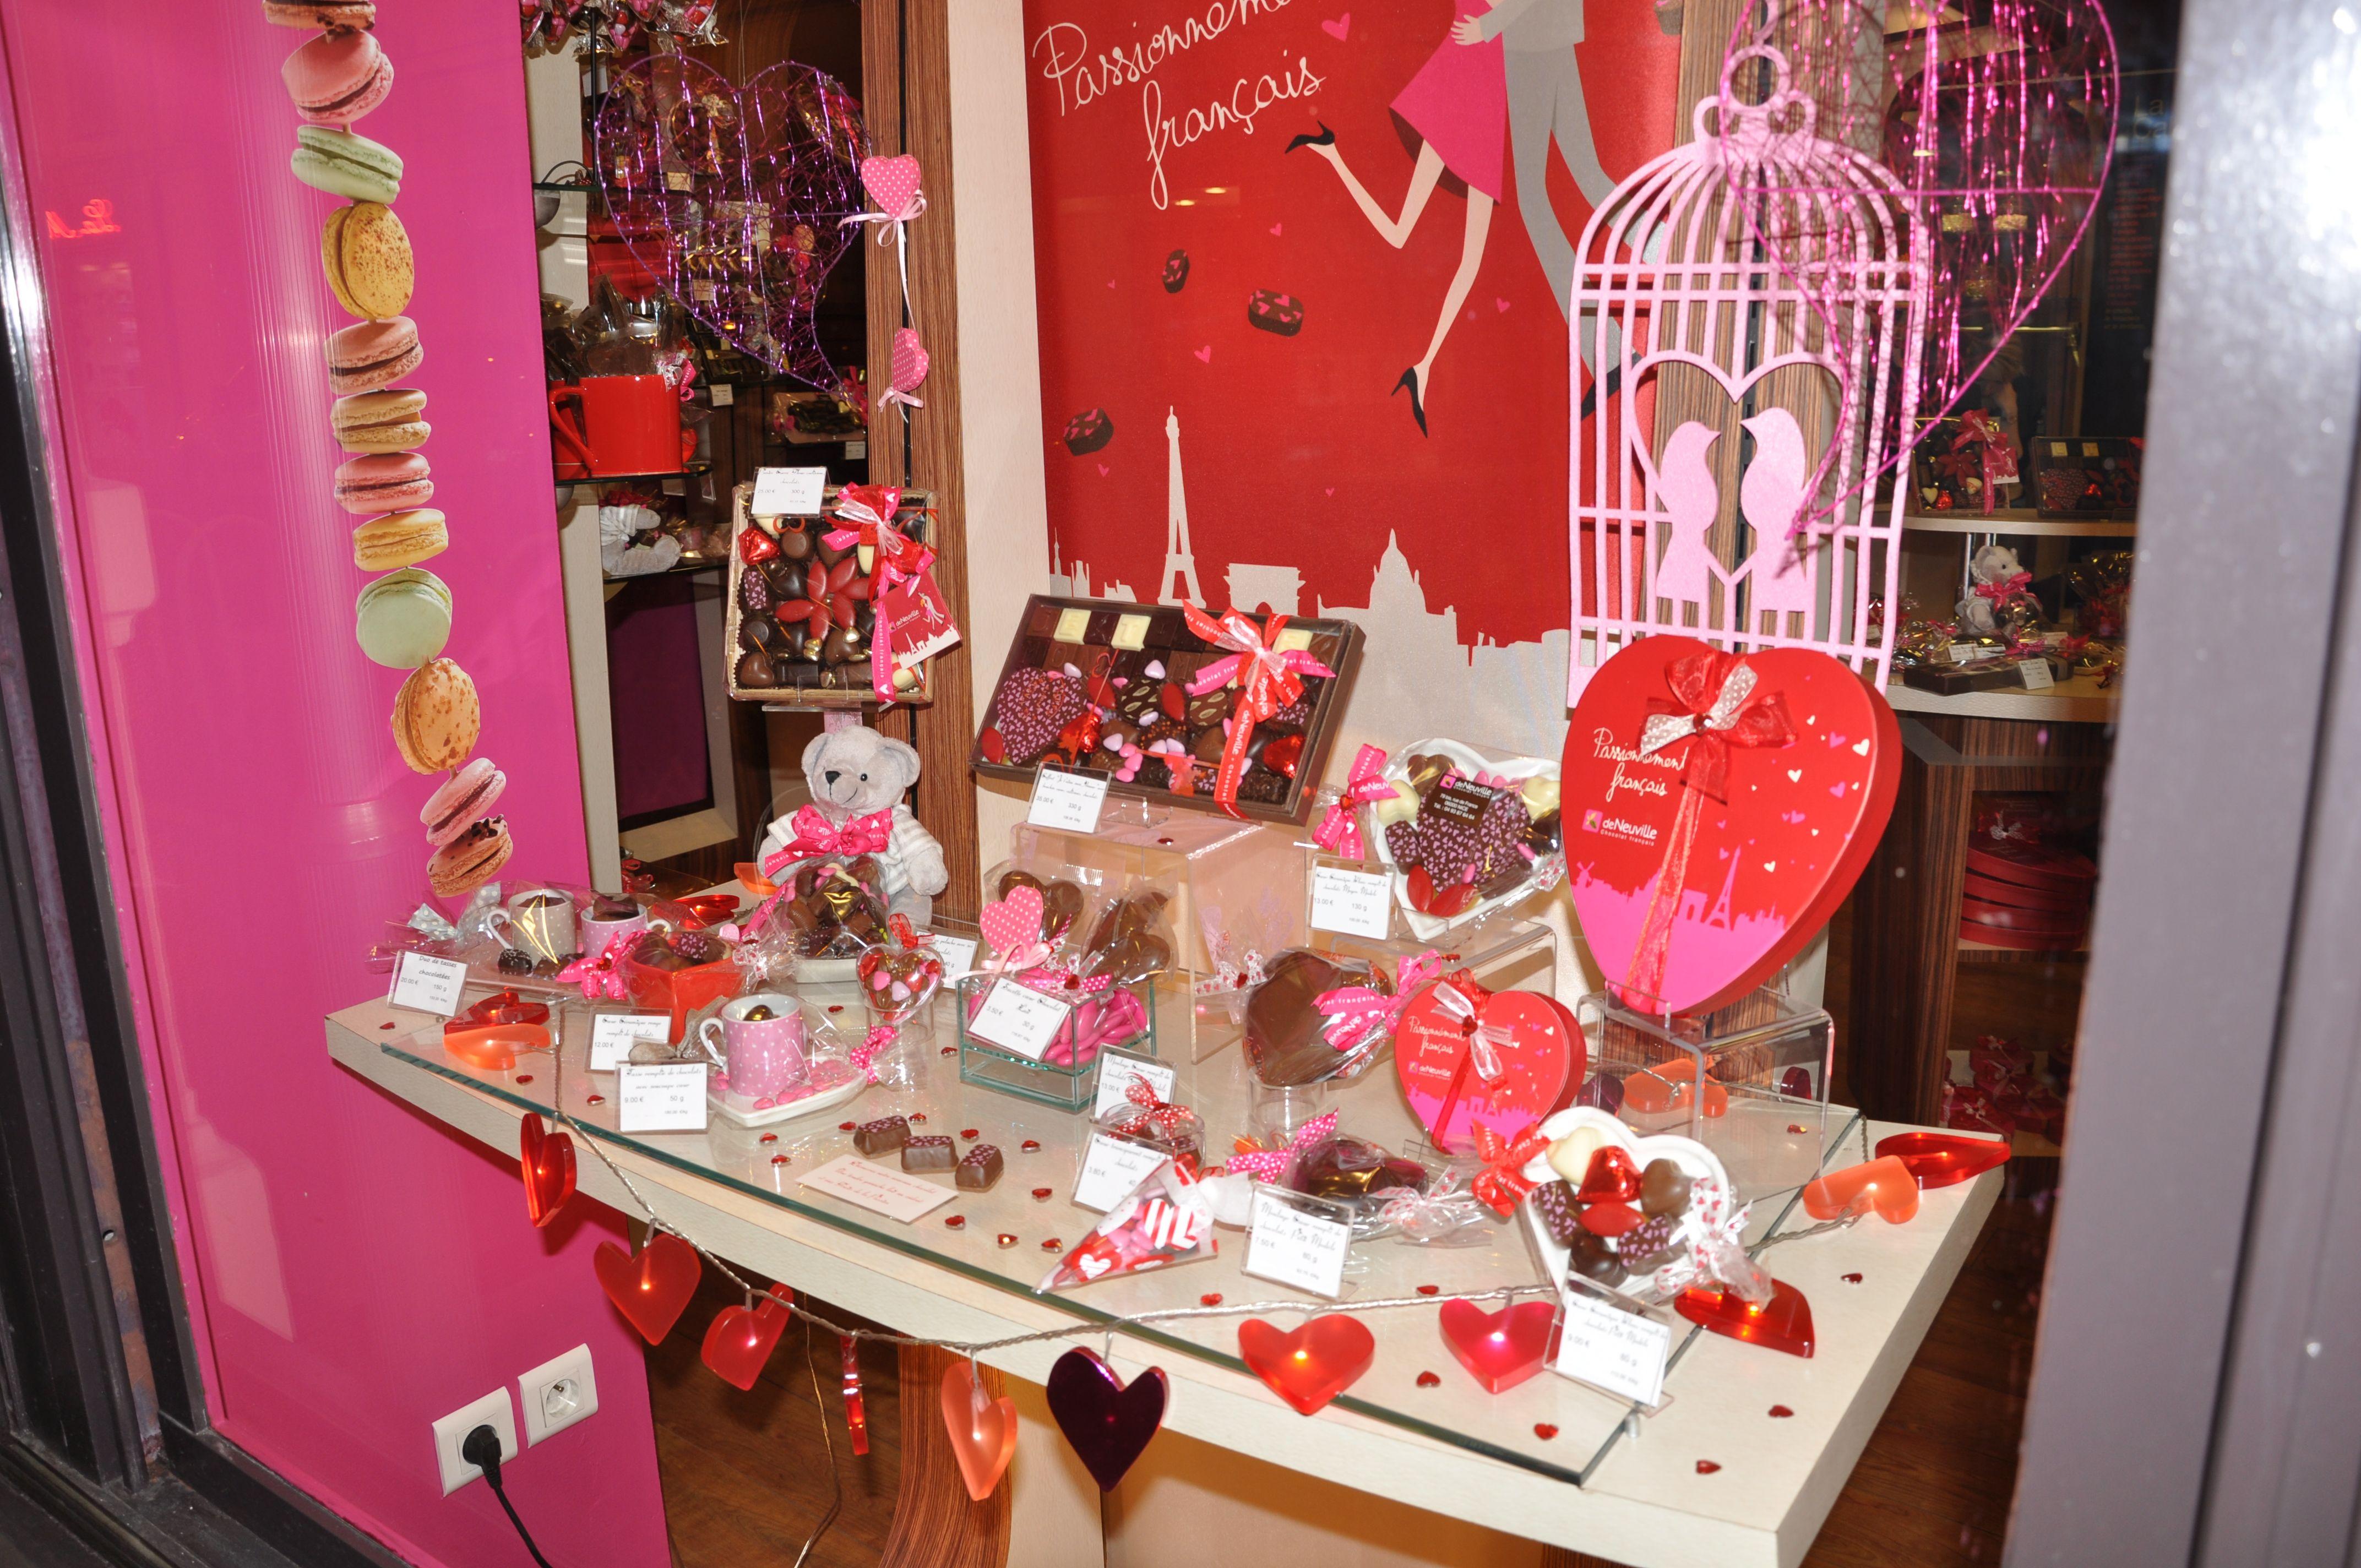 vitrine st valentin 2014 de neuville chocolat français nice | st